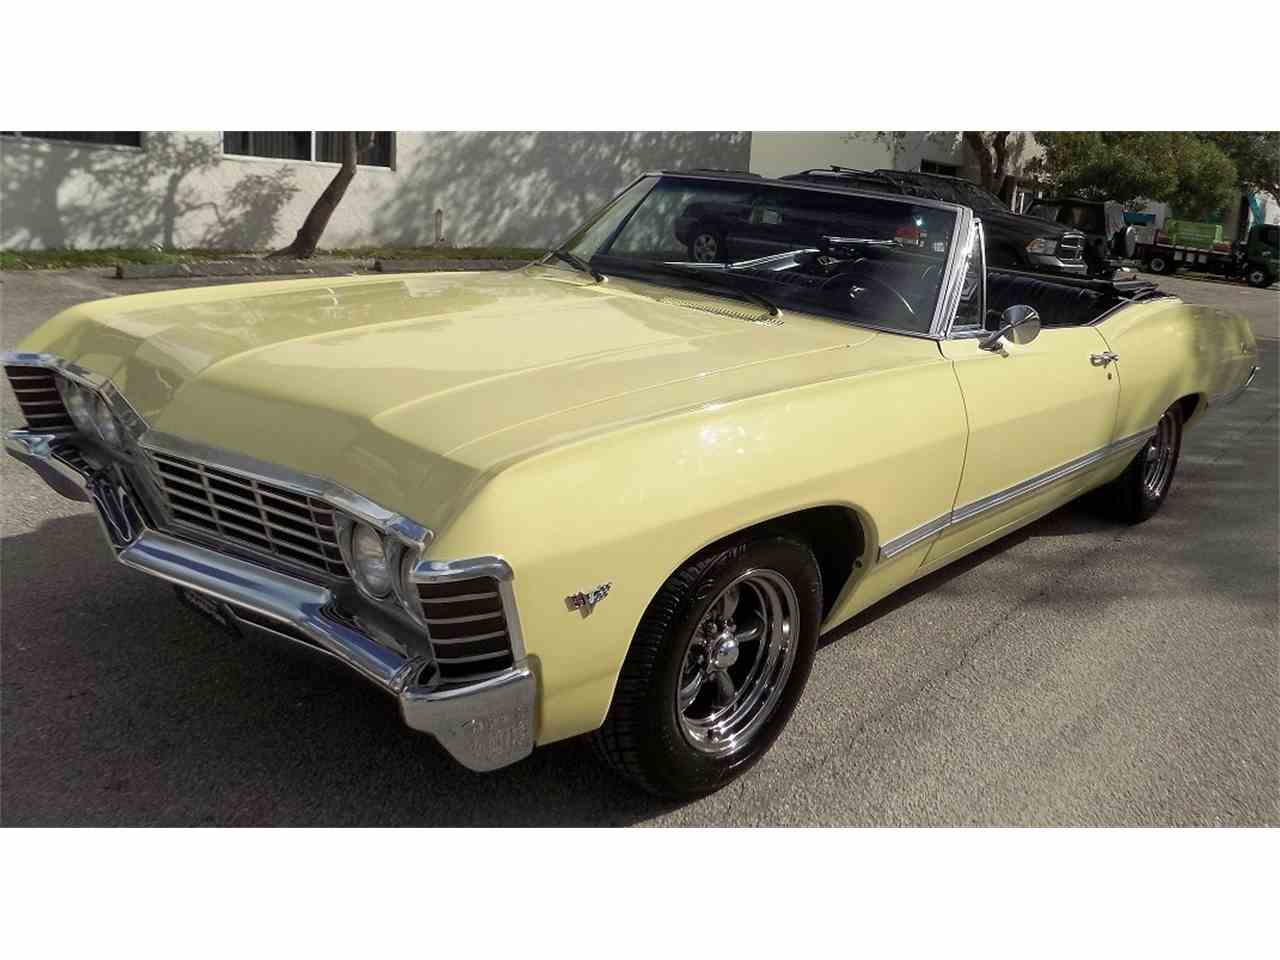 Chevrolet Impala For Sale ClassicCarscom CC - Pompano classic cars